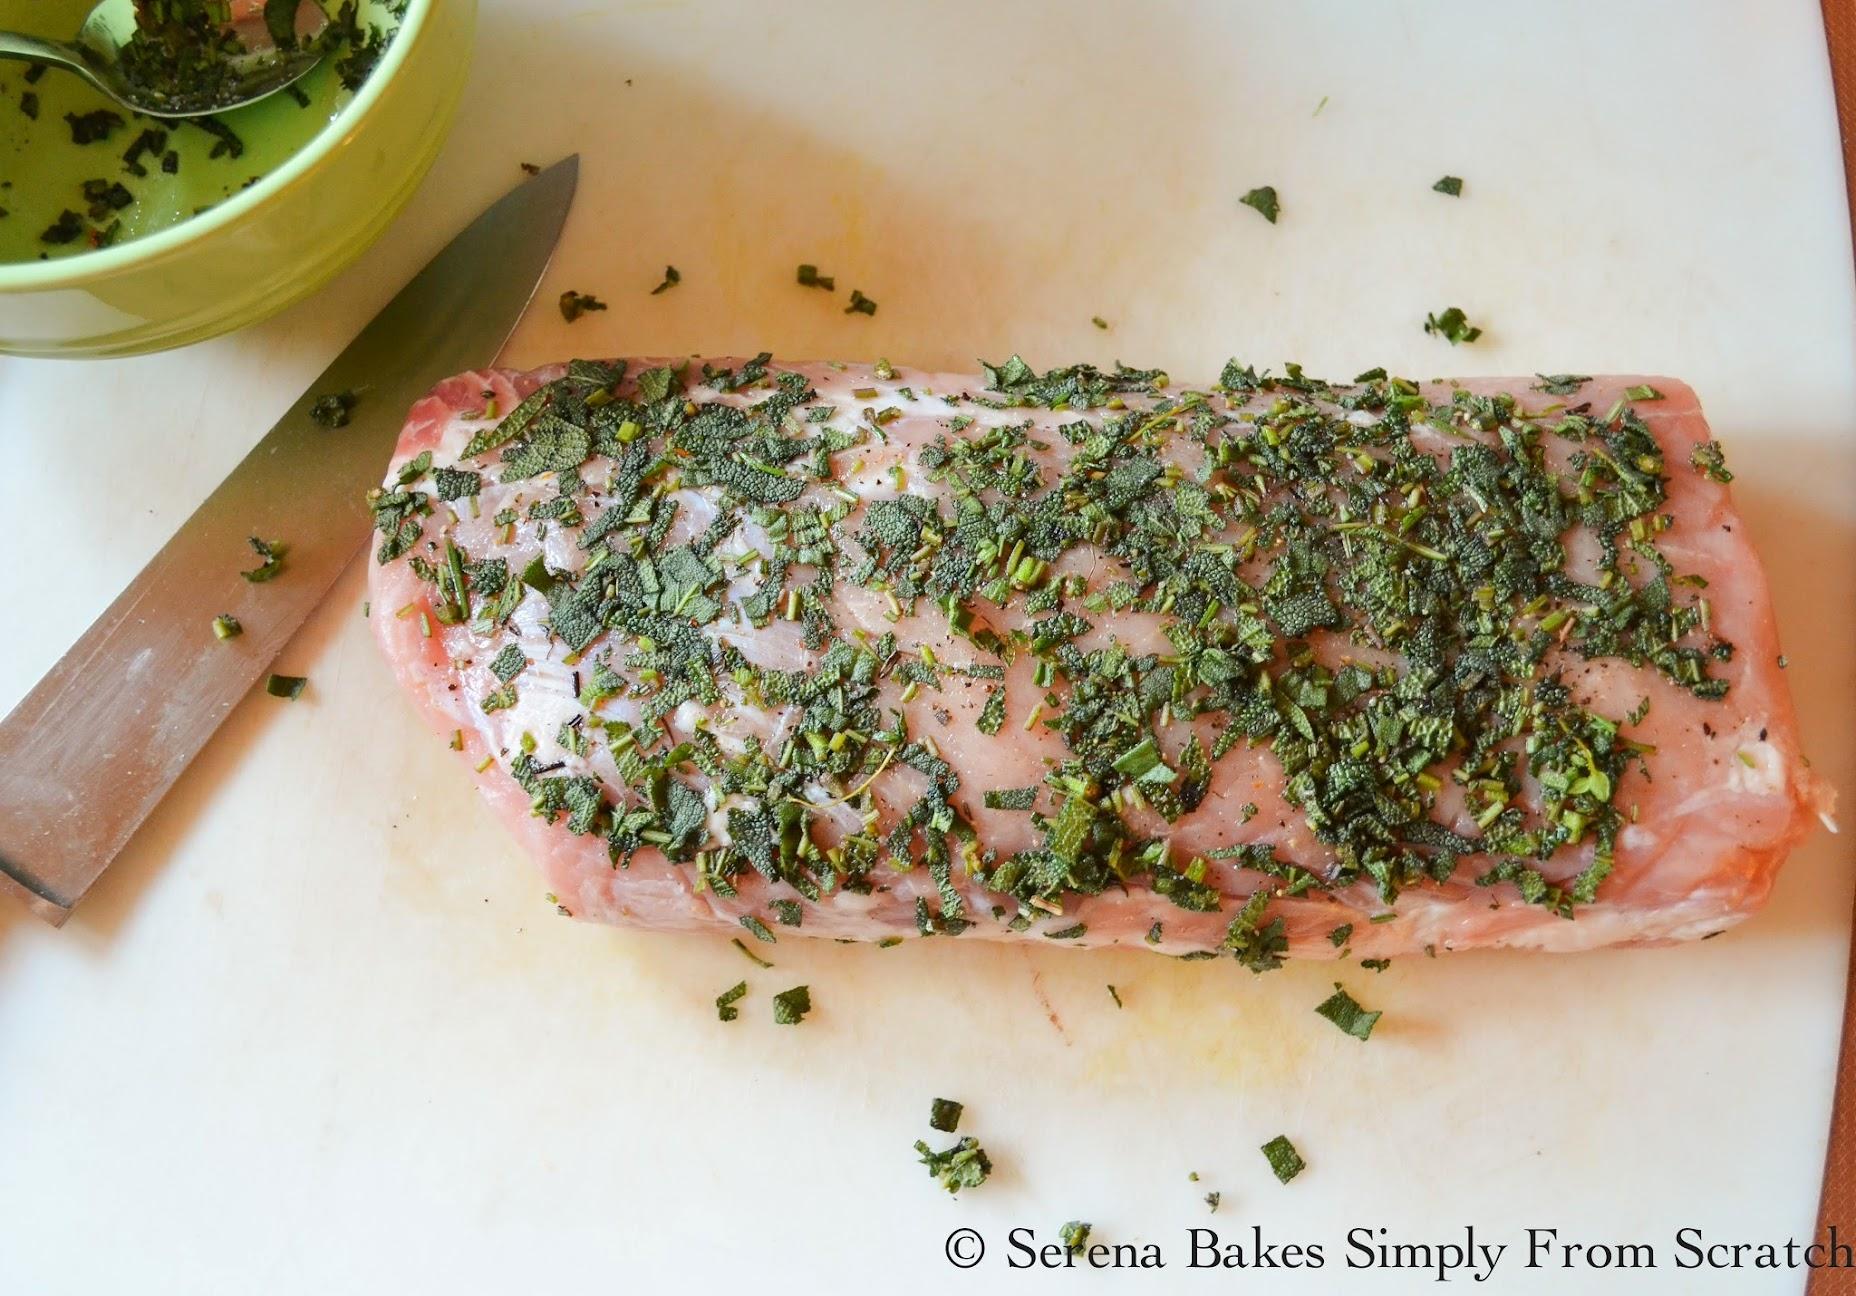 Rosemary-Sage-Pork-Loin-Roast-Herb-Rub.jpg